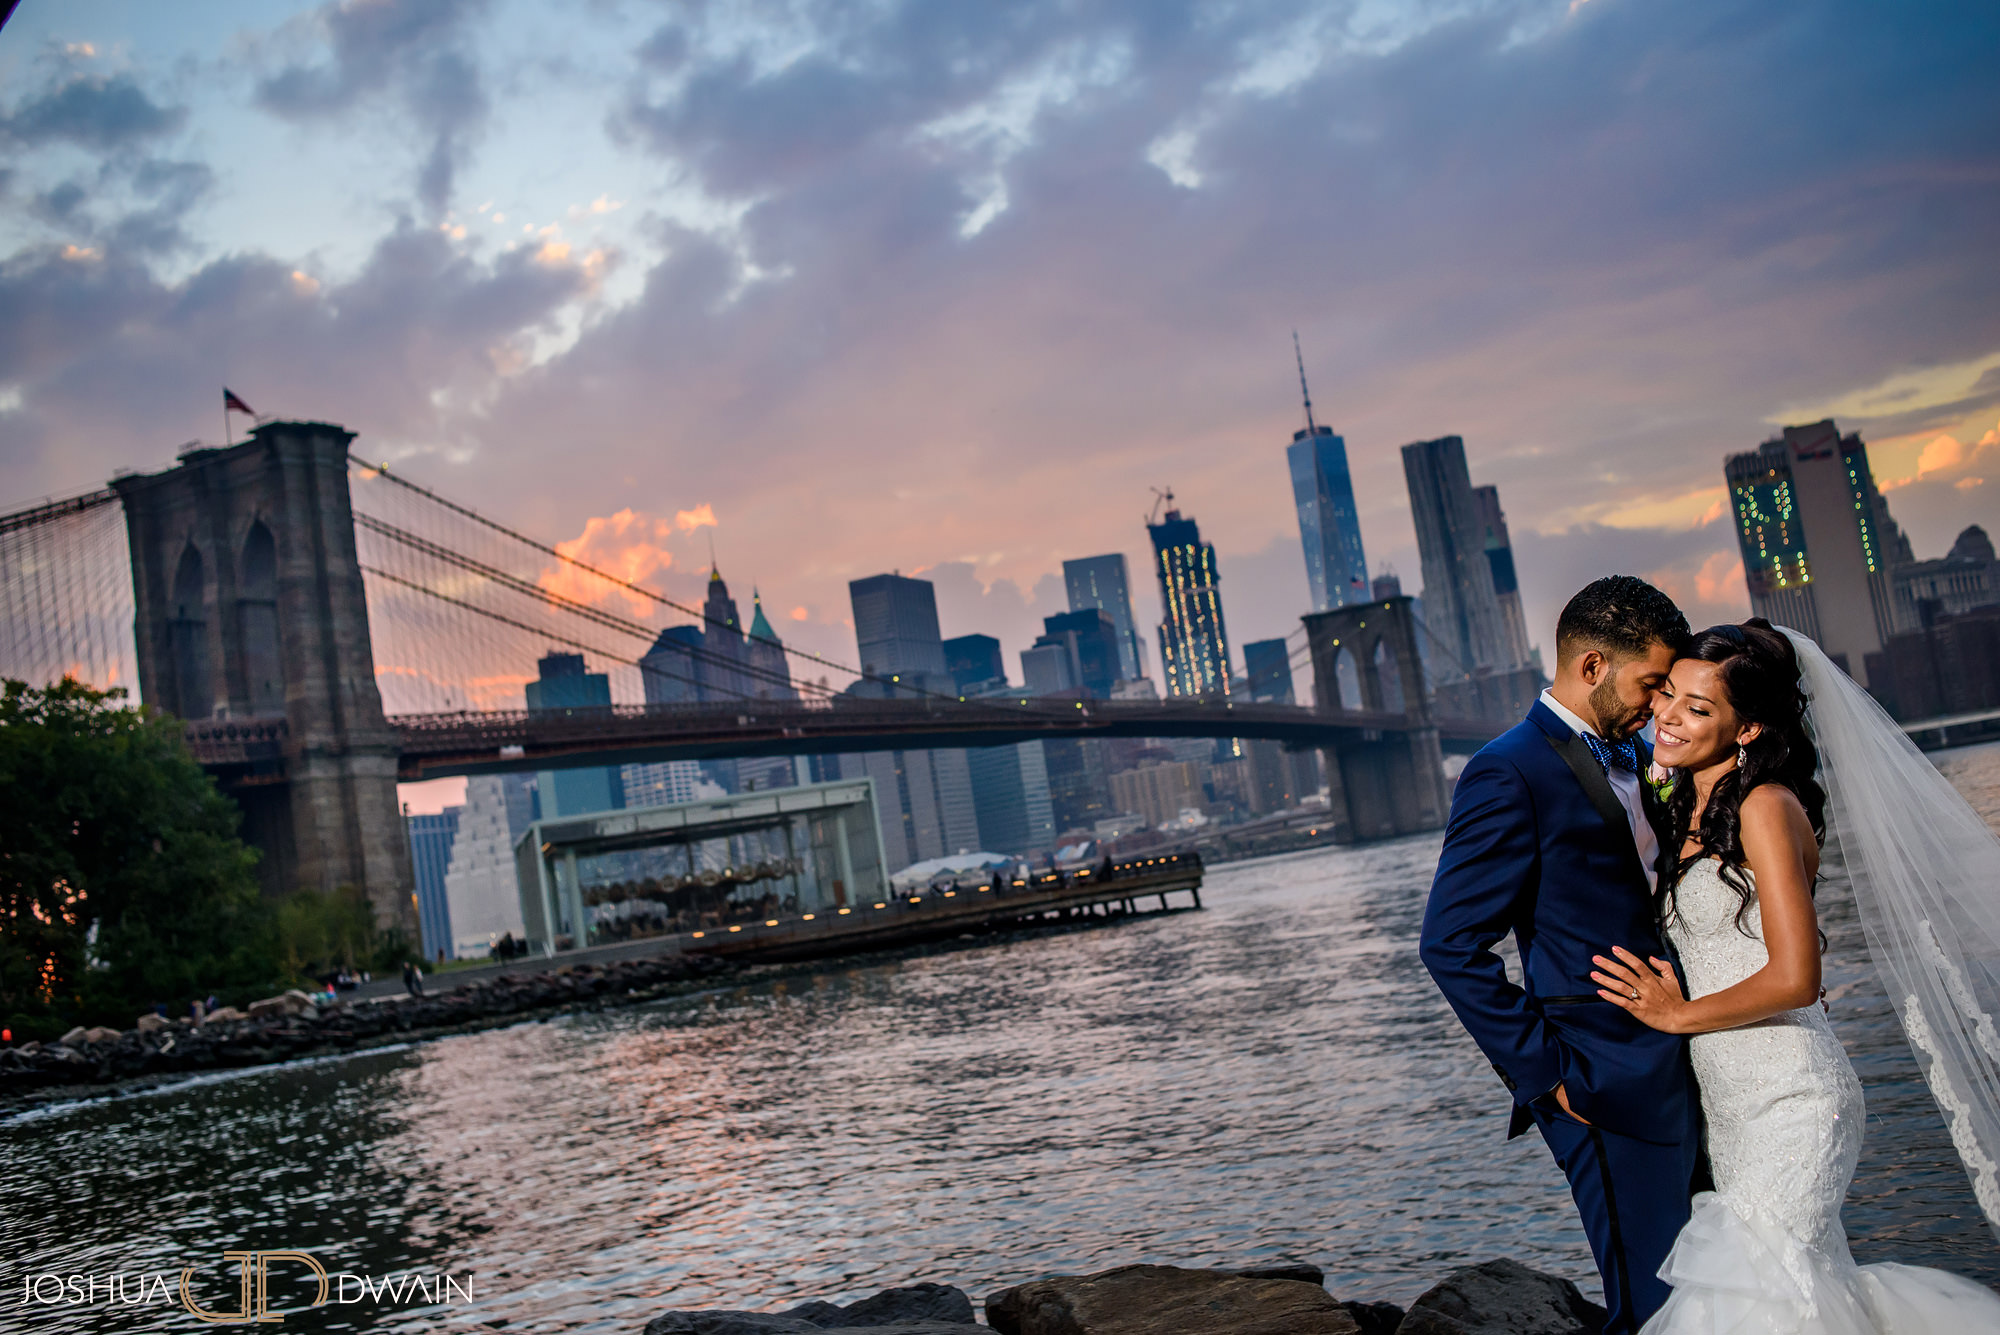 joshua-dwain-weddings-gallery-best-wedding-photographers-us-014